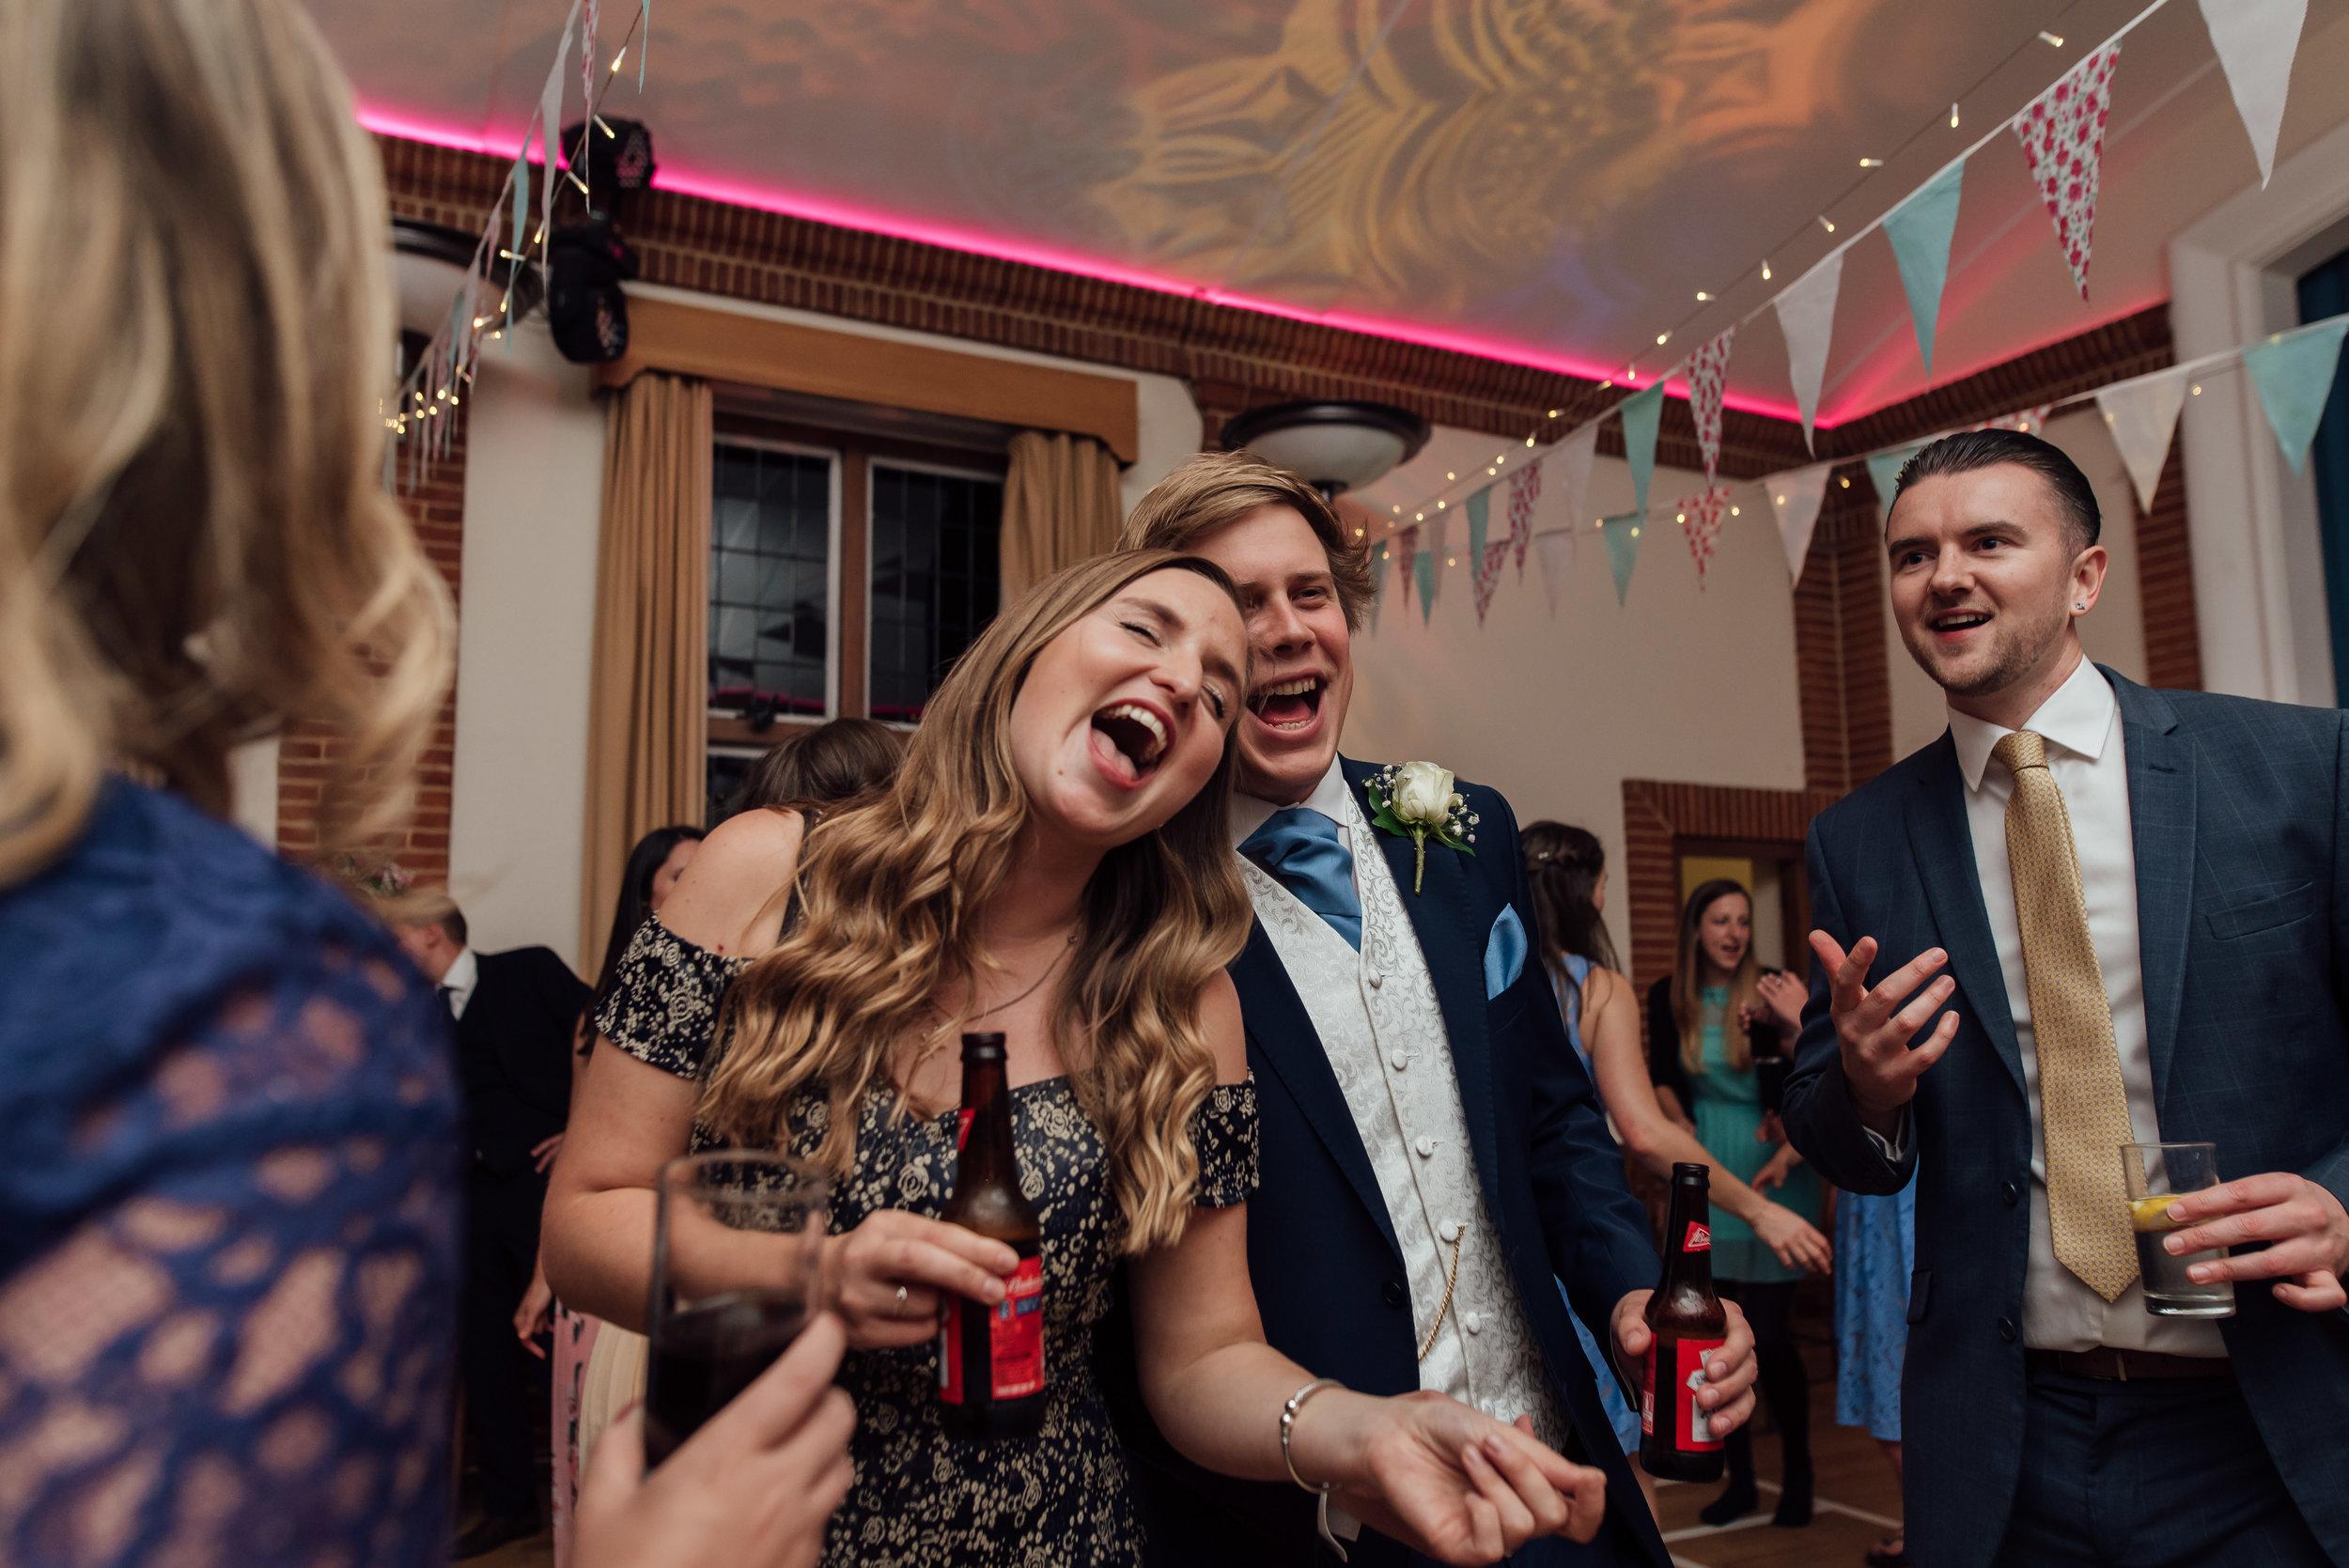 wedding-dancing-rotherwick-village-hall-wedding-hampshire / Amy-james-photography / Hampshire-wedding-photographer-hampshire / Amy-james-photography